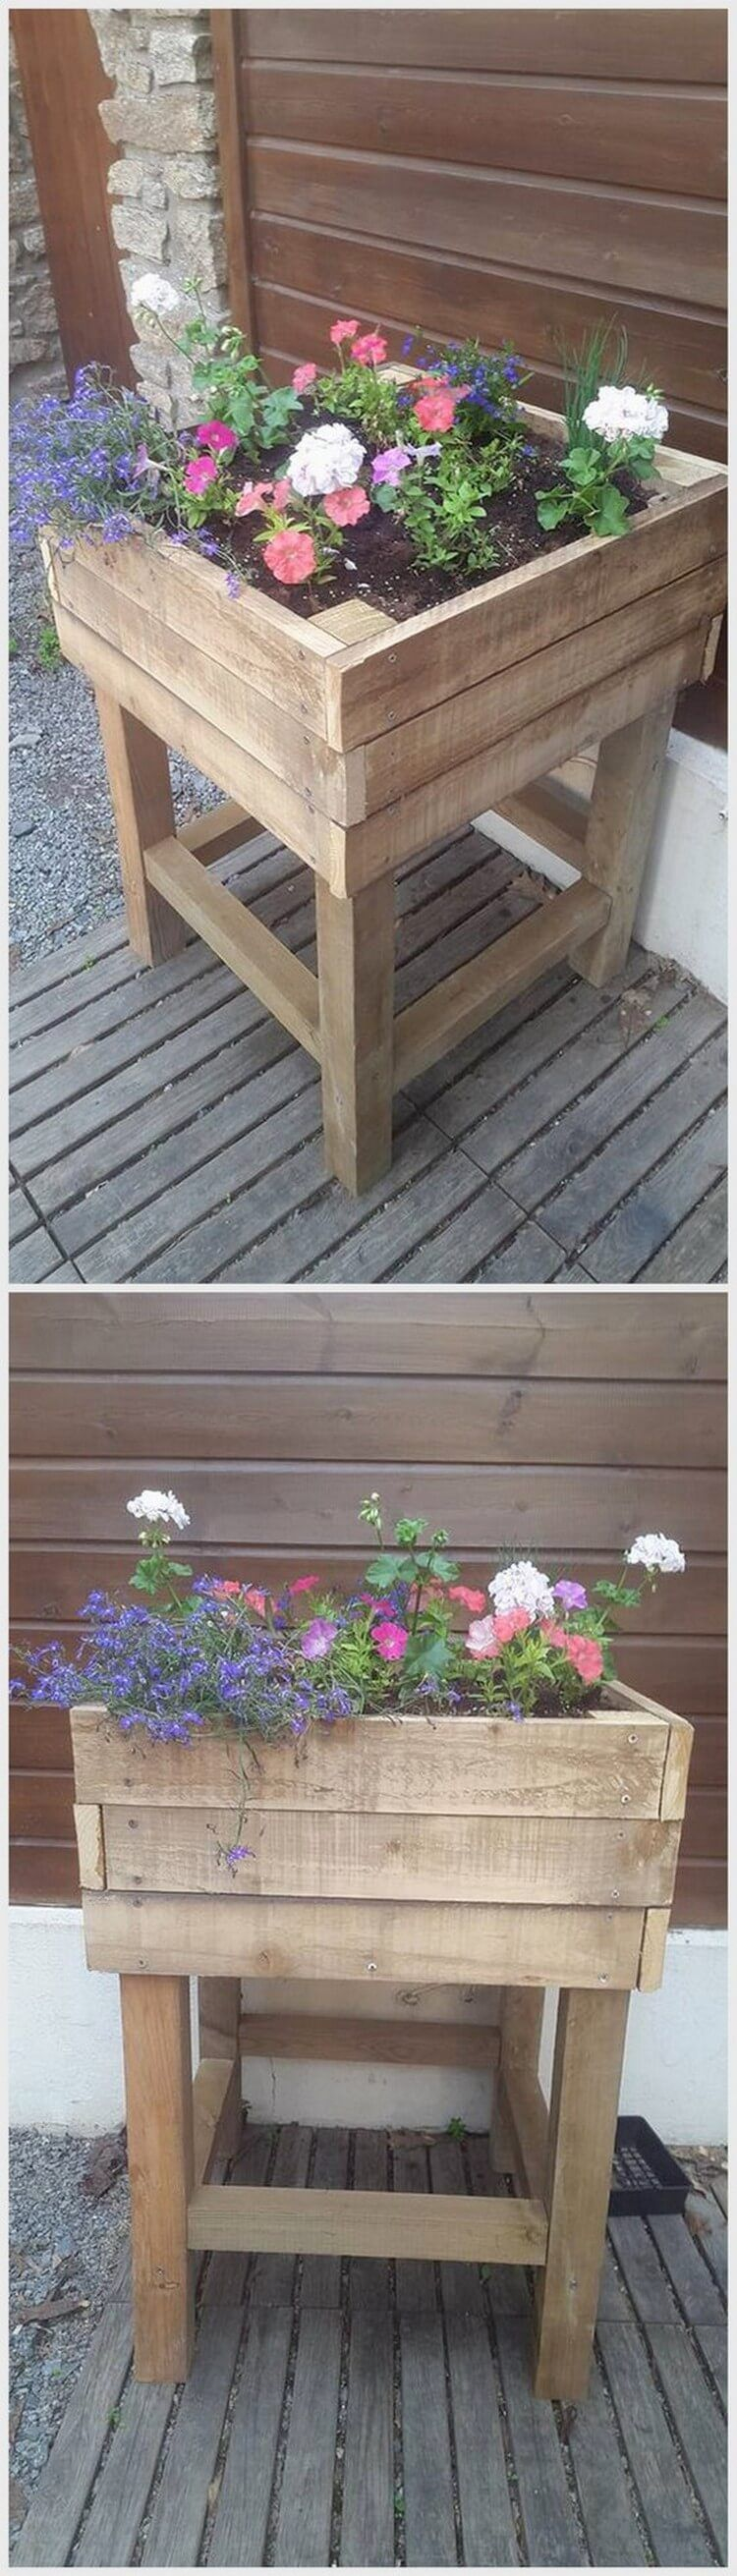 Genius Ideas for Wooden Pallet Recreations Wood pallet